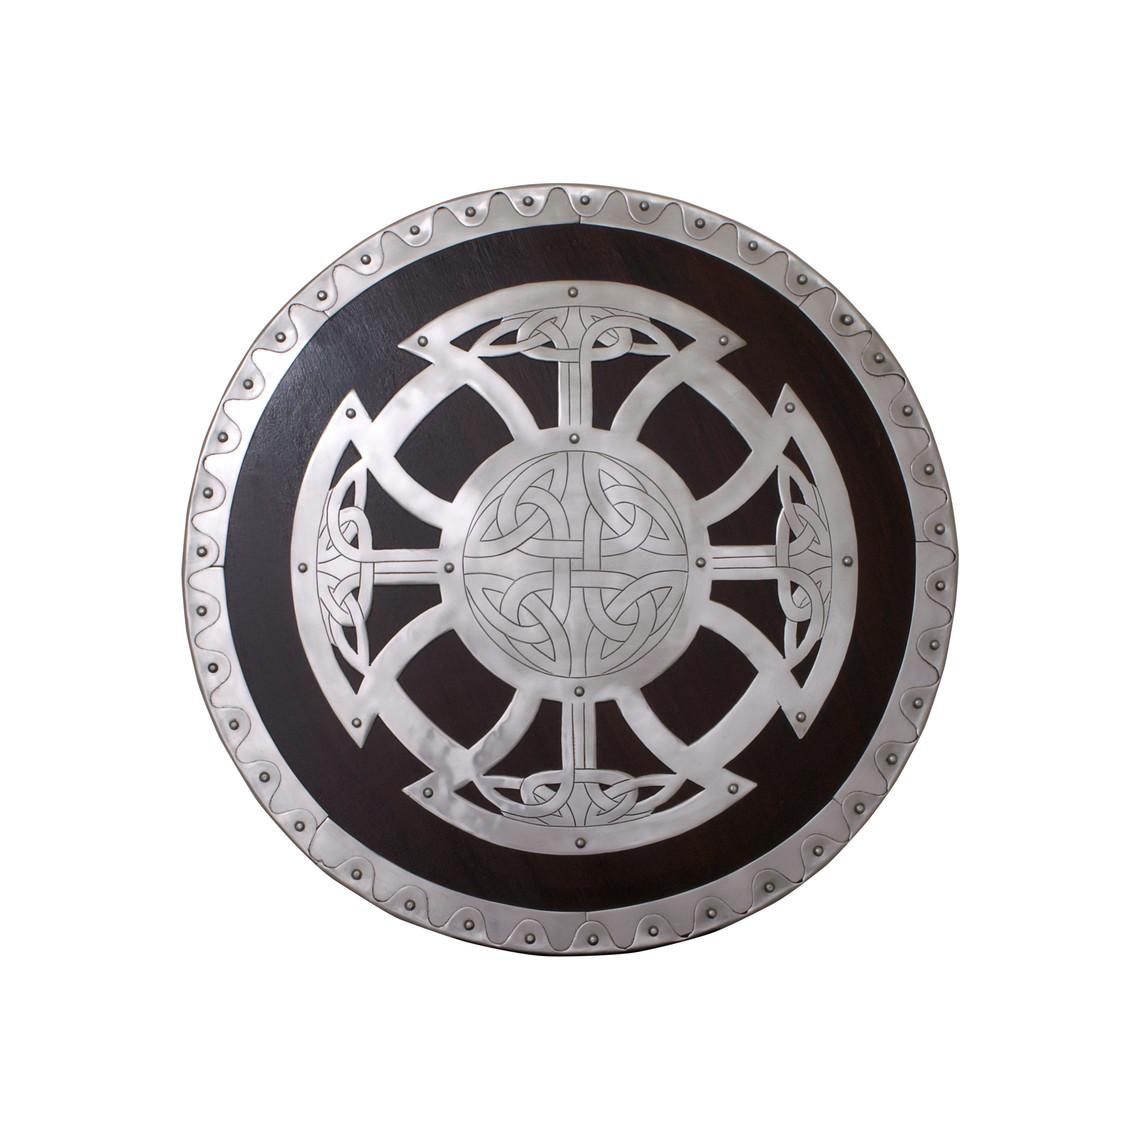 Ulfberth Viking shield with knot motif